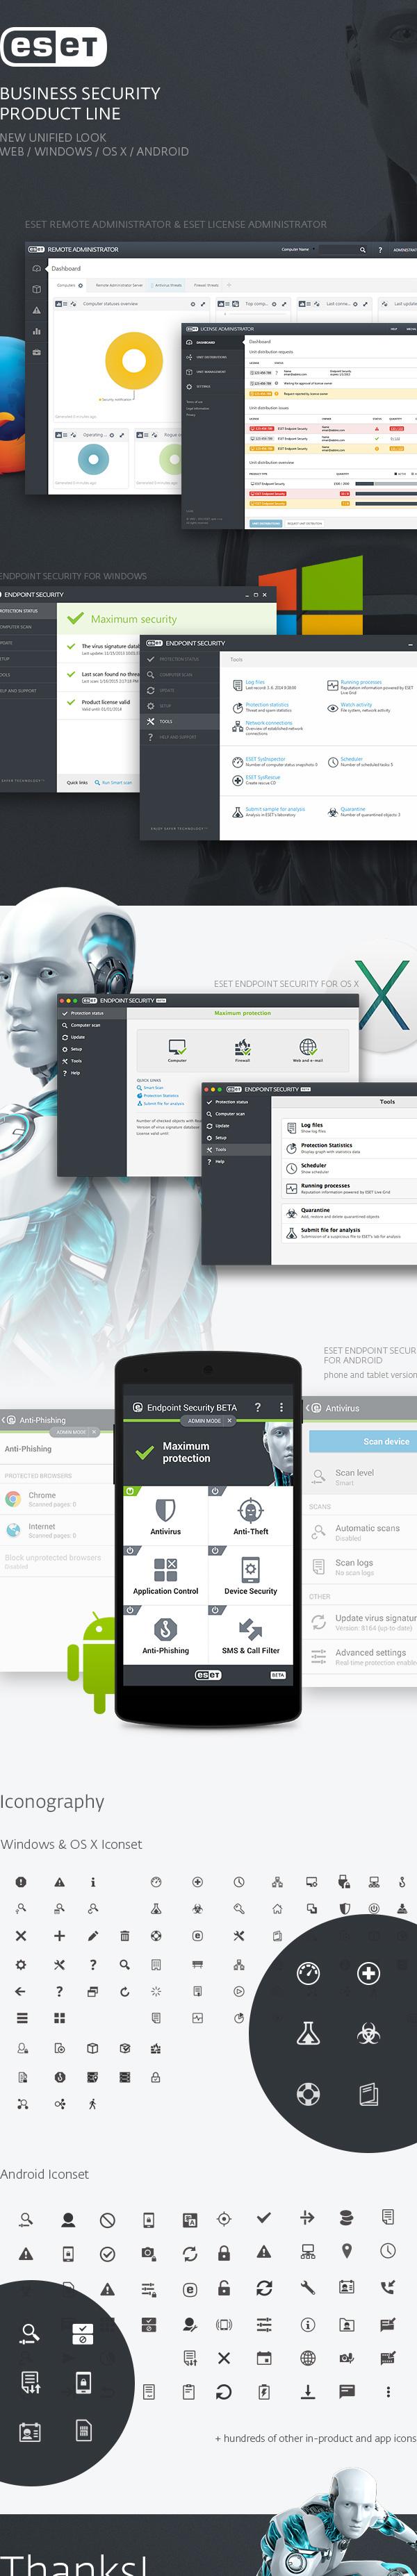 ESET,business,redesign,icons,mac,os x,windows,application,Program,android,security,robot,antivirus,flat,app